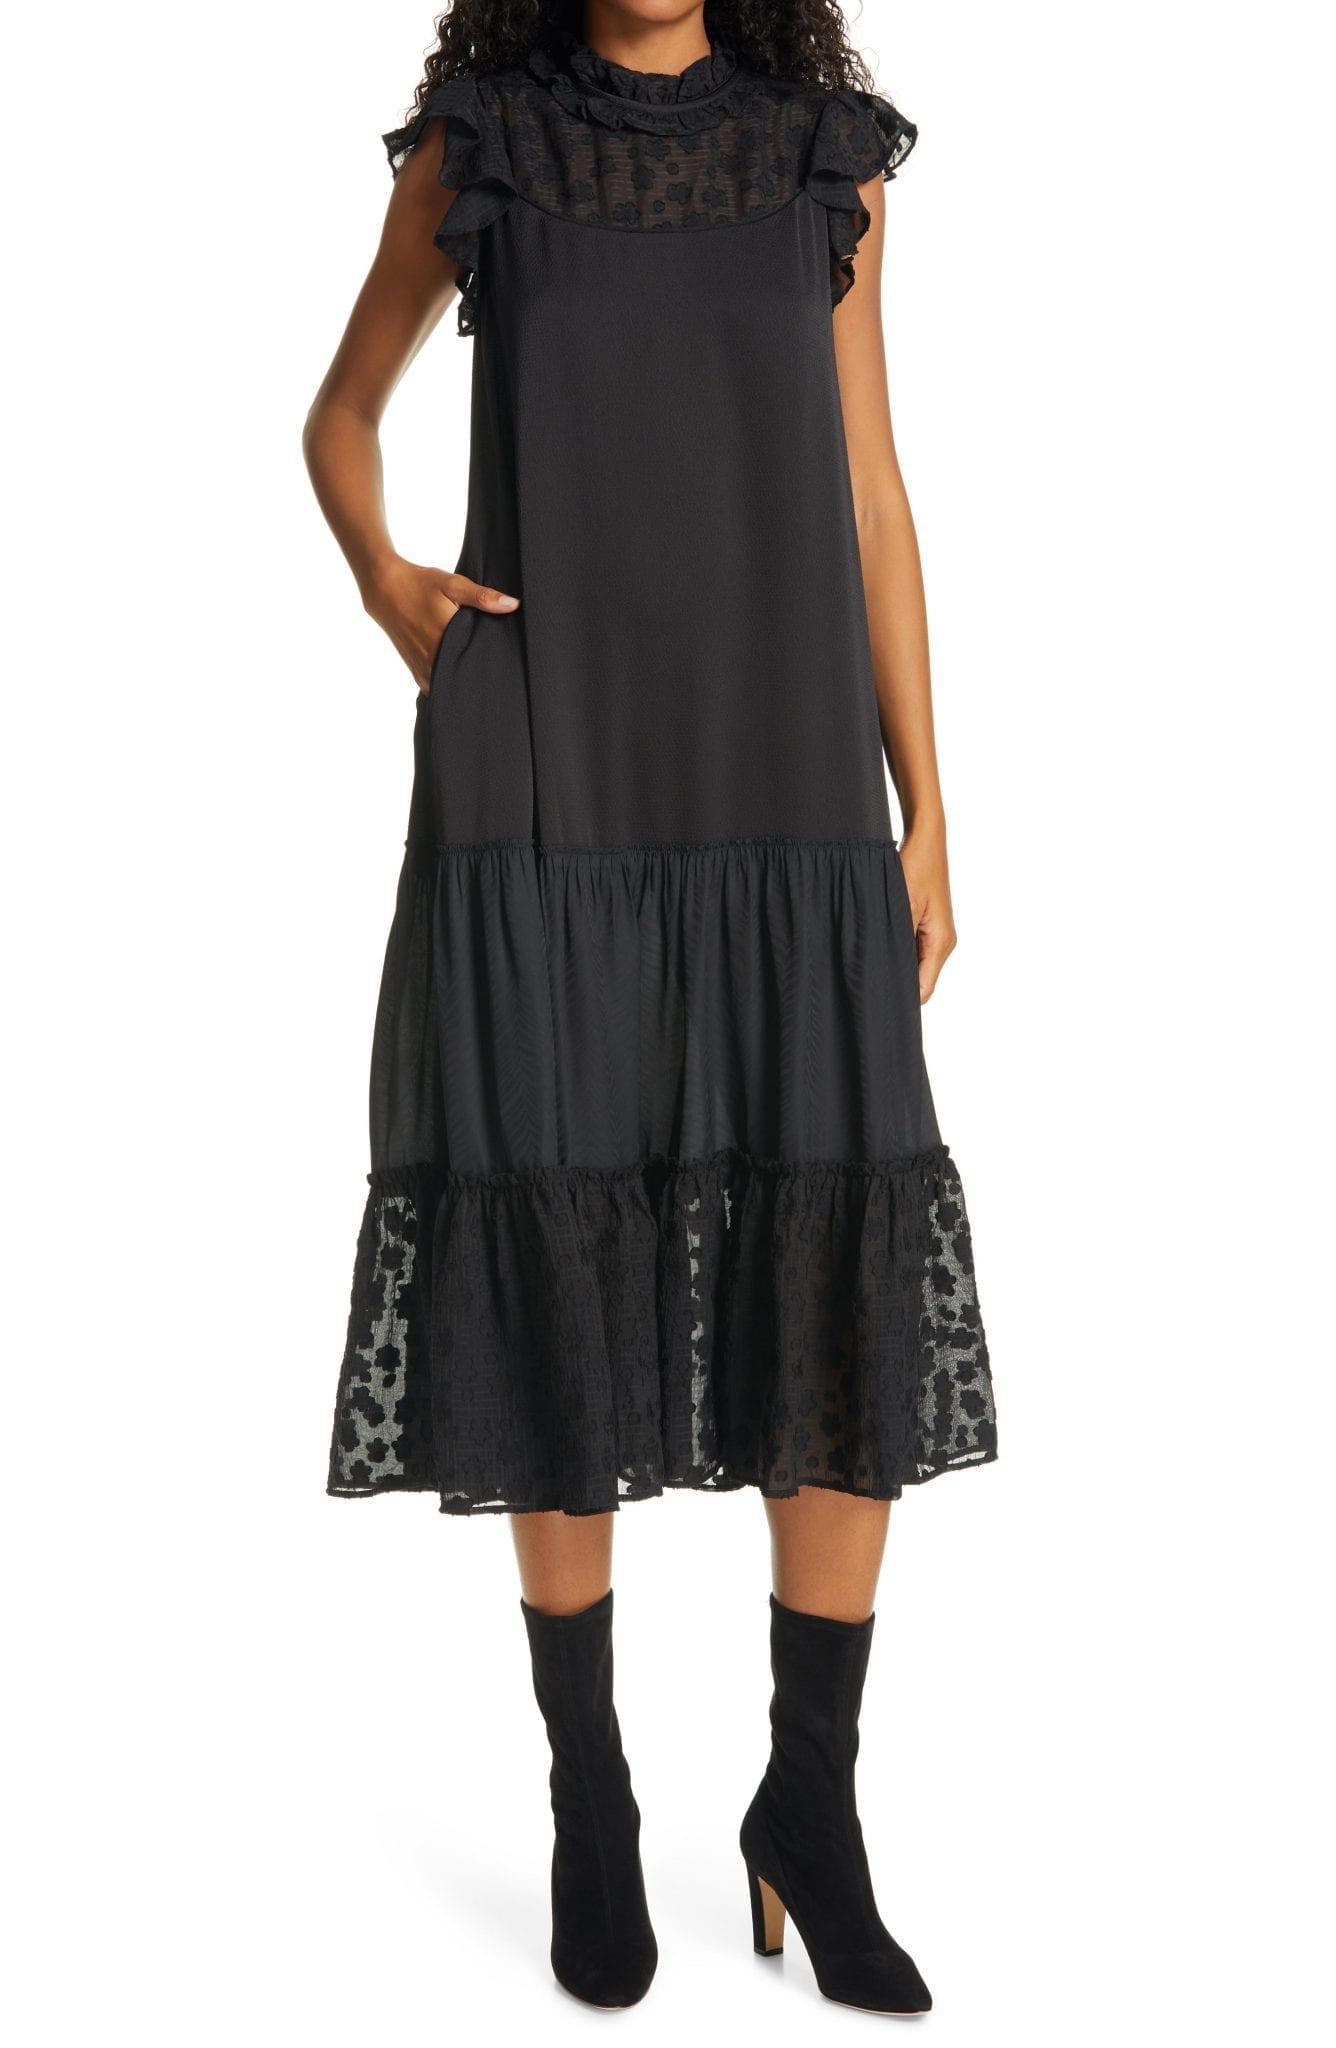 SAMSØE SAMSØE Opala Tiered Lace Dress